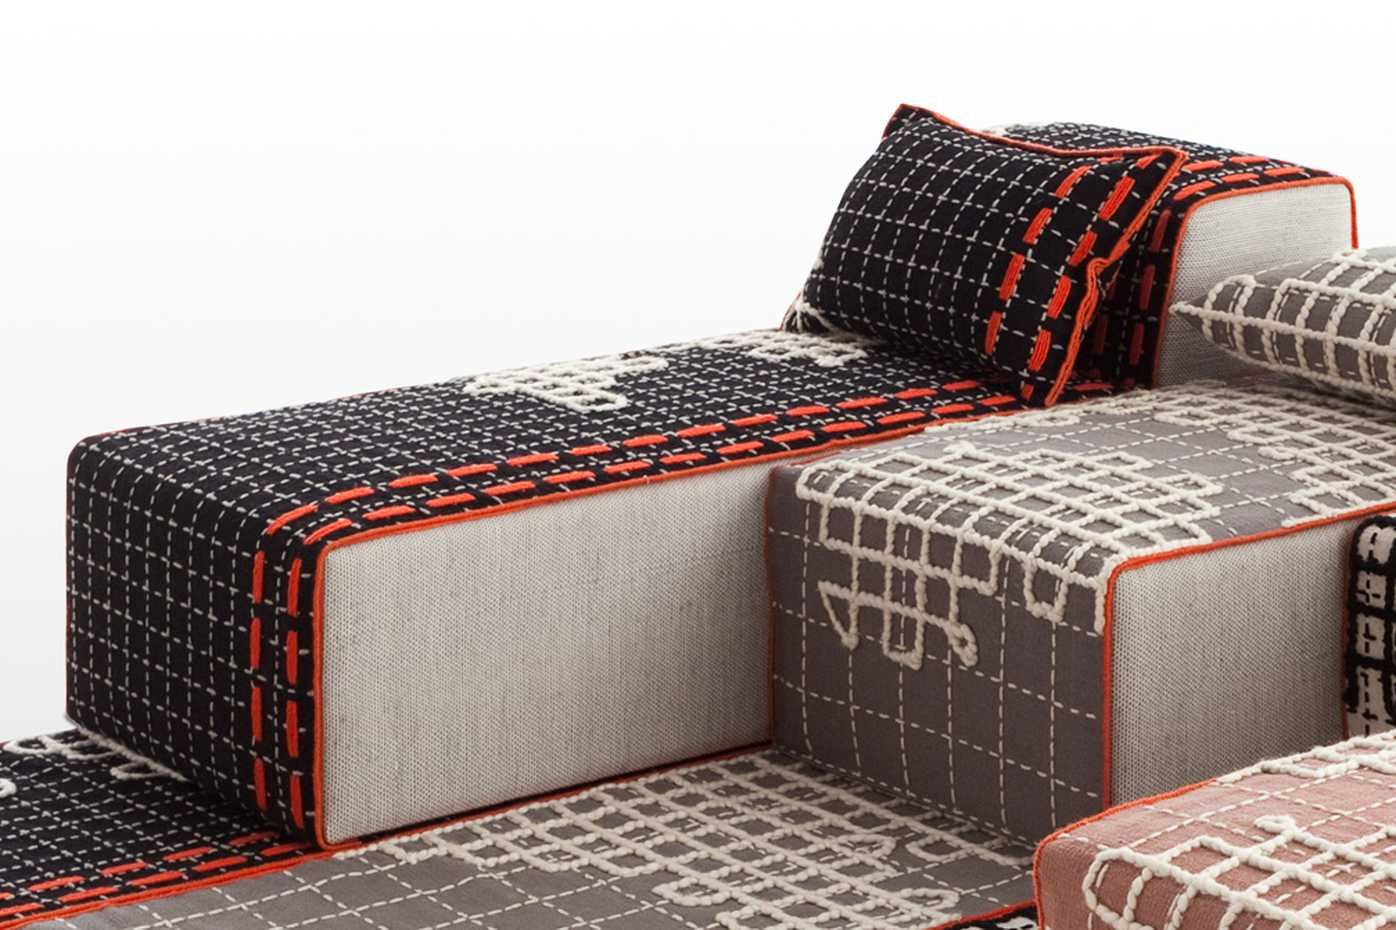 Bandas Chaiselongue by Gan Rugs product image 1